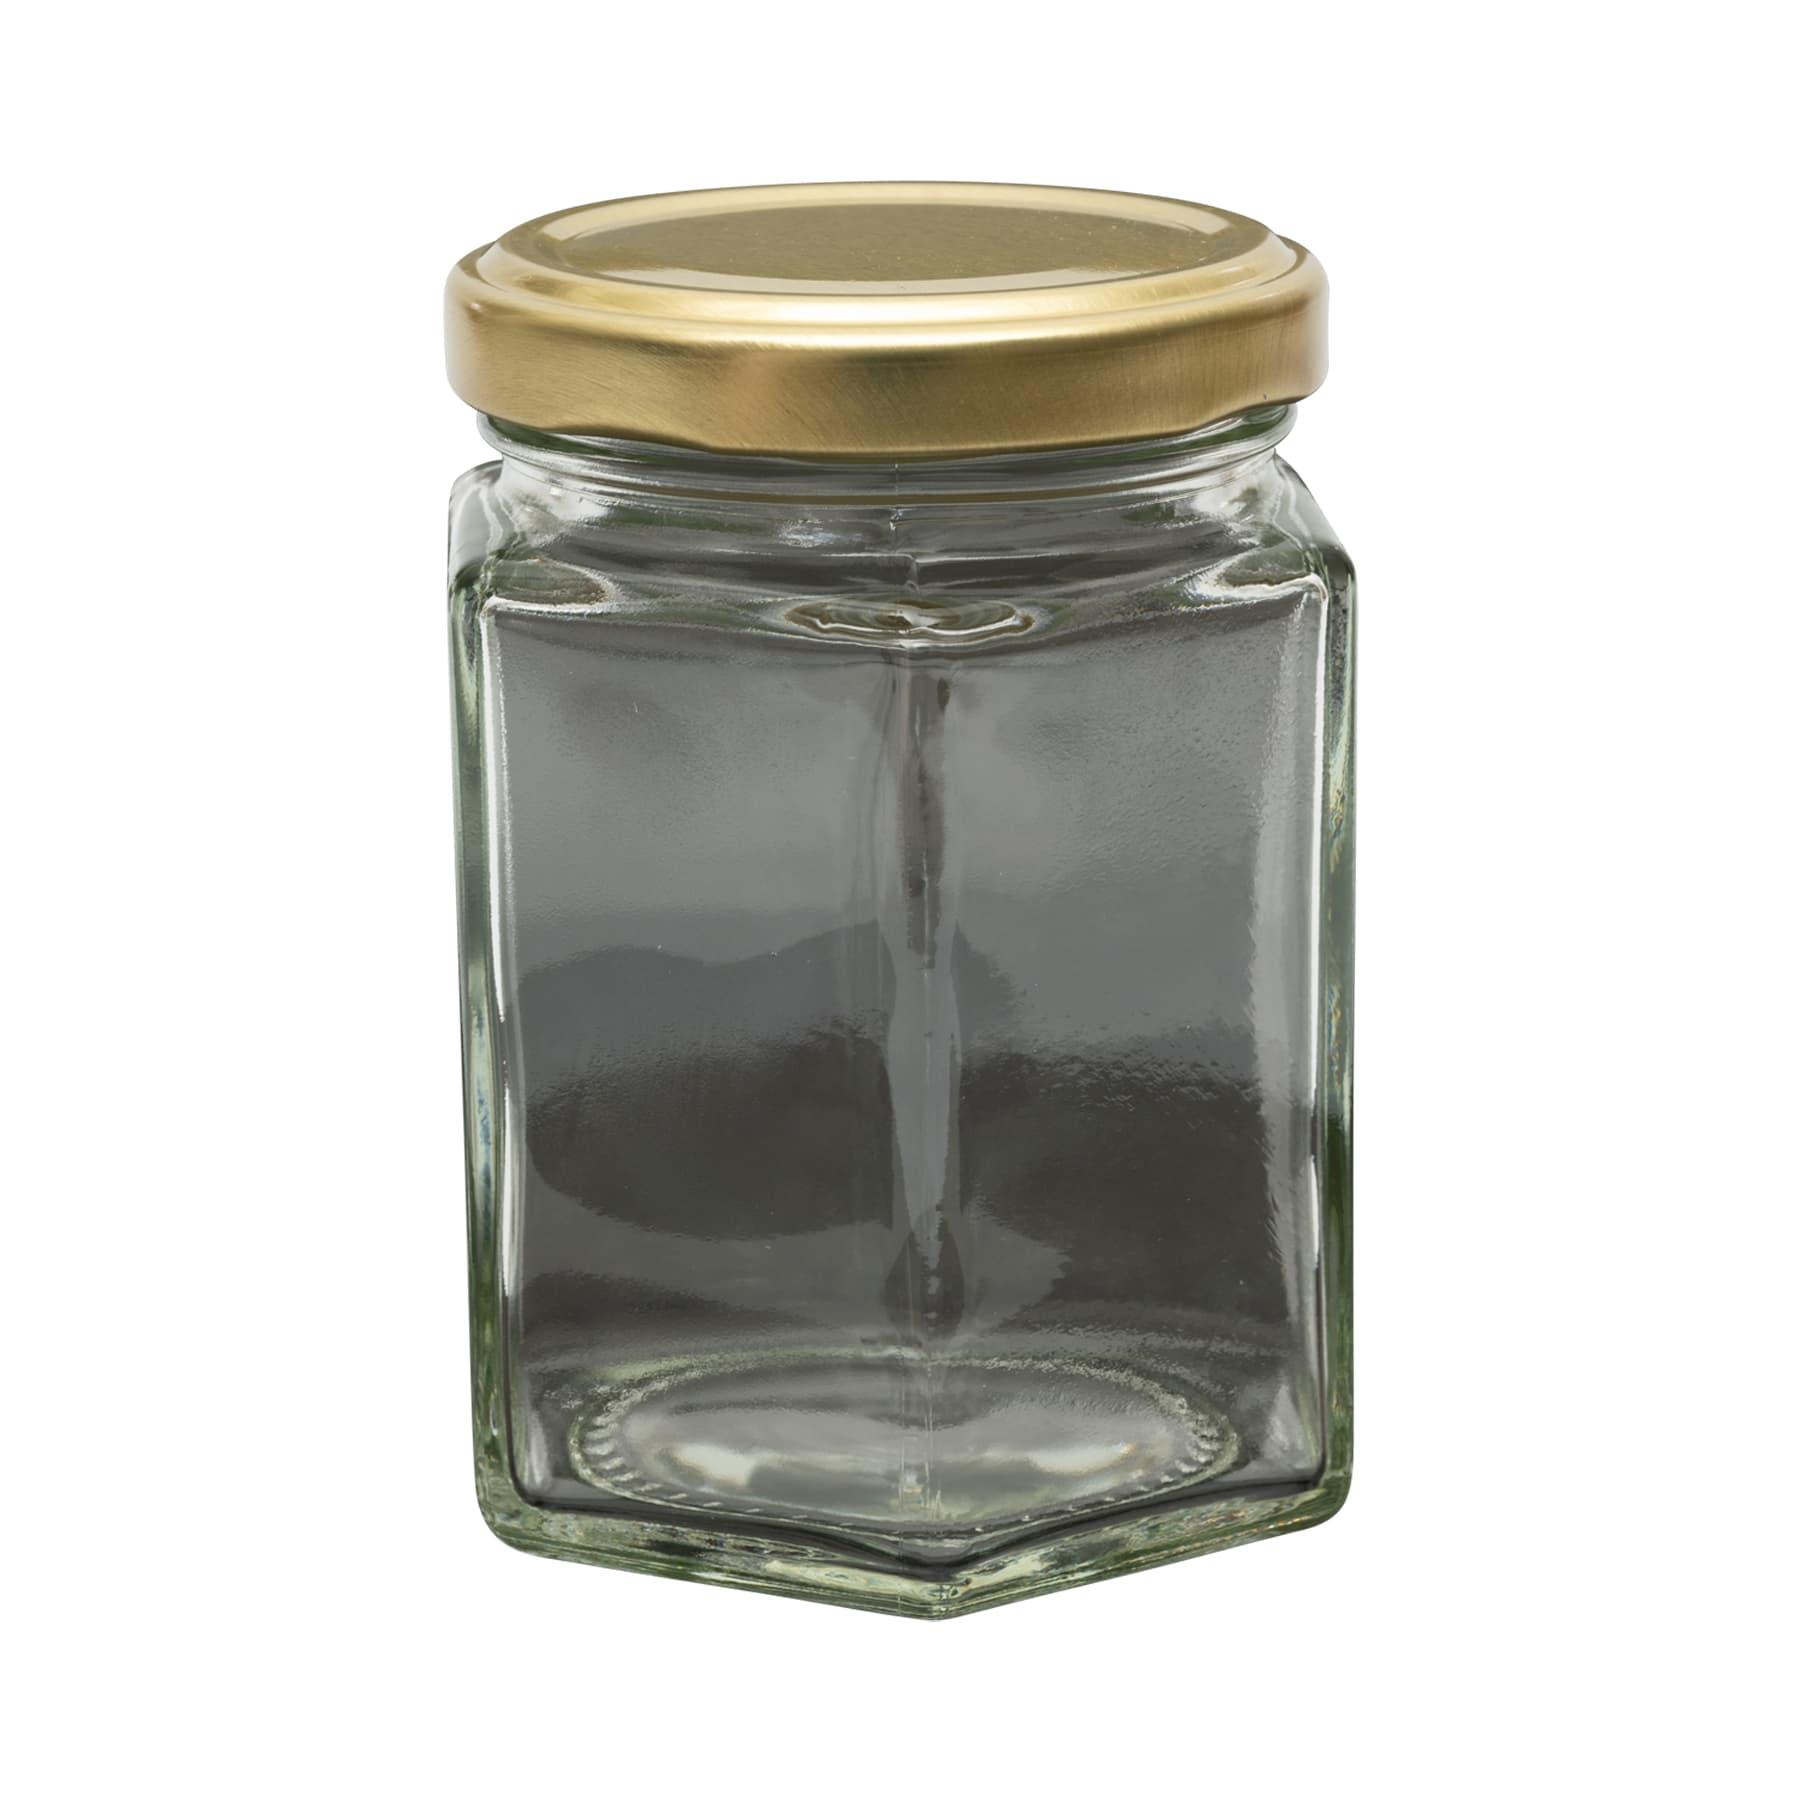 Sechseckglas 250 g (195 ml) 1 PAL(2849 Stk.) inkl. TO Metalldeckel gold 58mm, lose, FREI HAUS